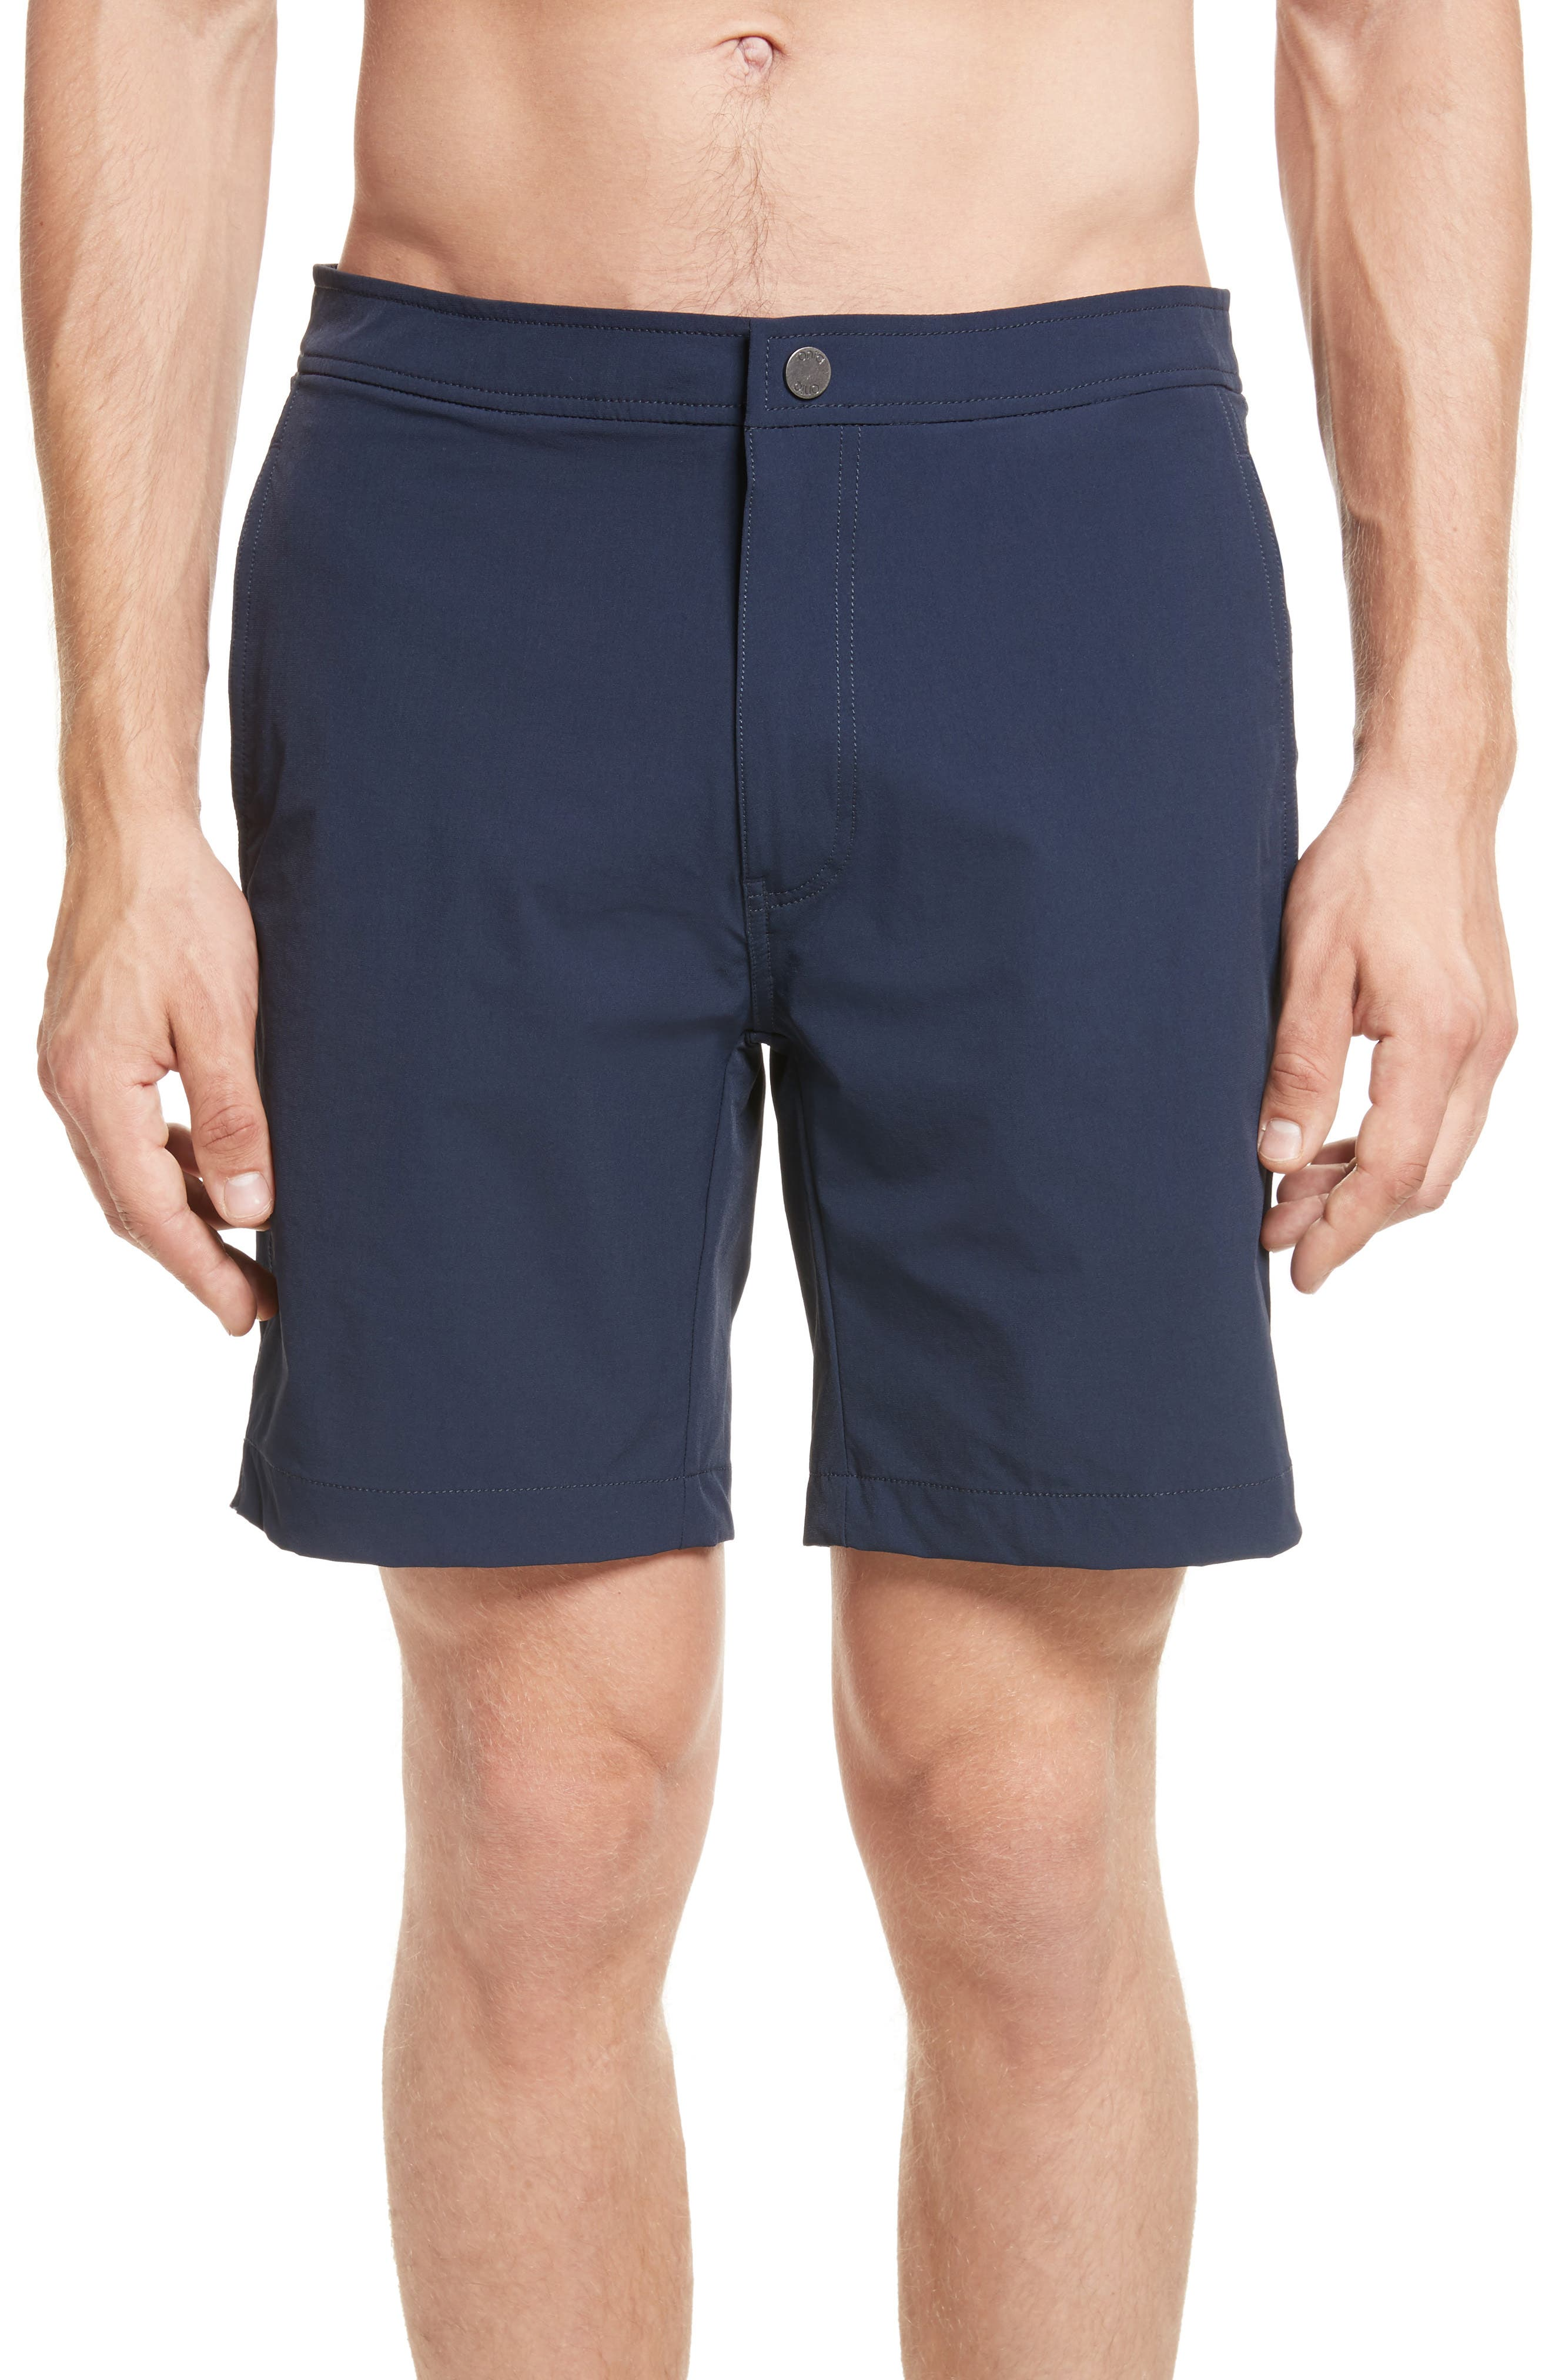 Vintage Men's Swimsuits – 1930s, 1940s, 1950s Mens Onia Calder Swim Trunks Size 36 - Blue $38.99 AT vintagedancer.com